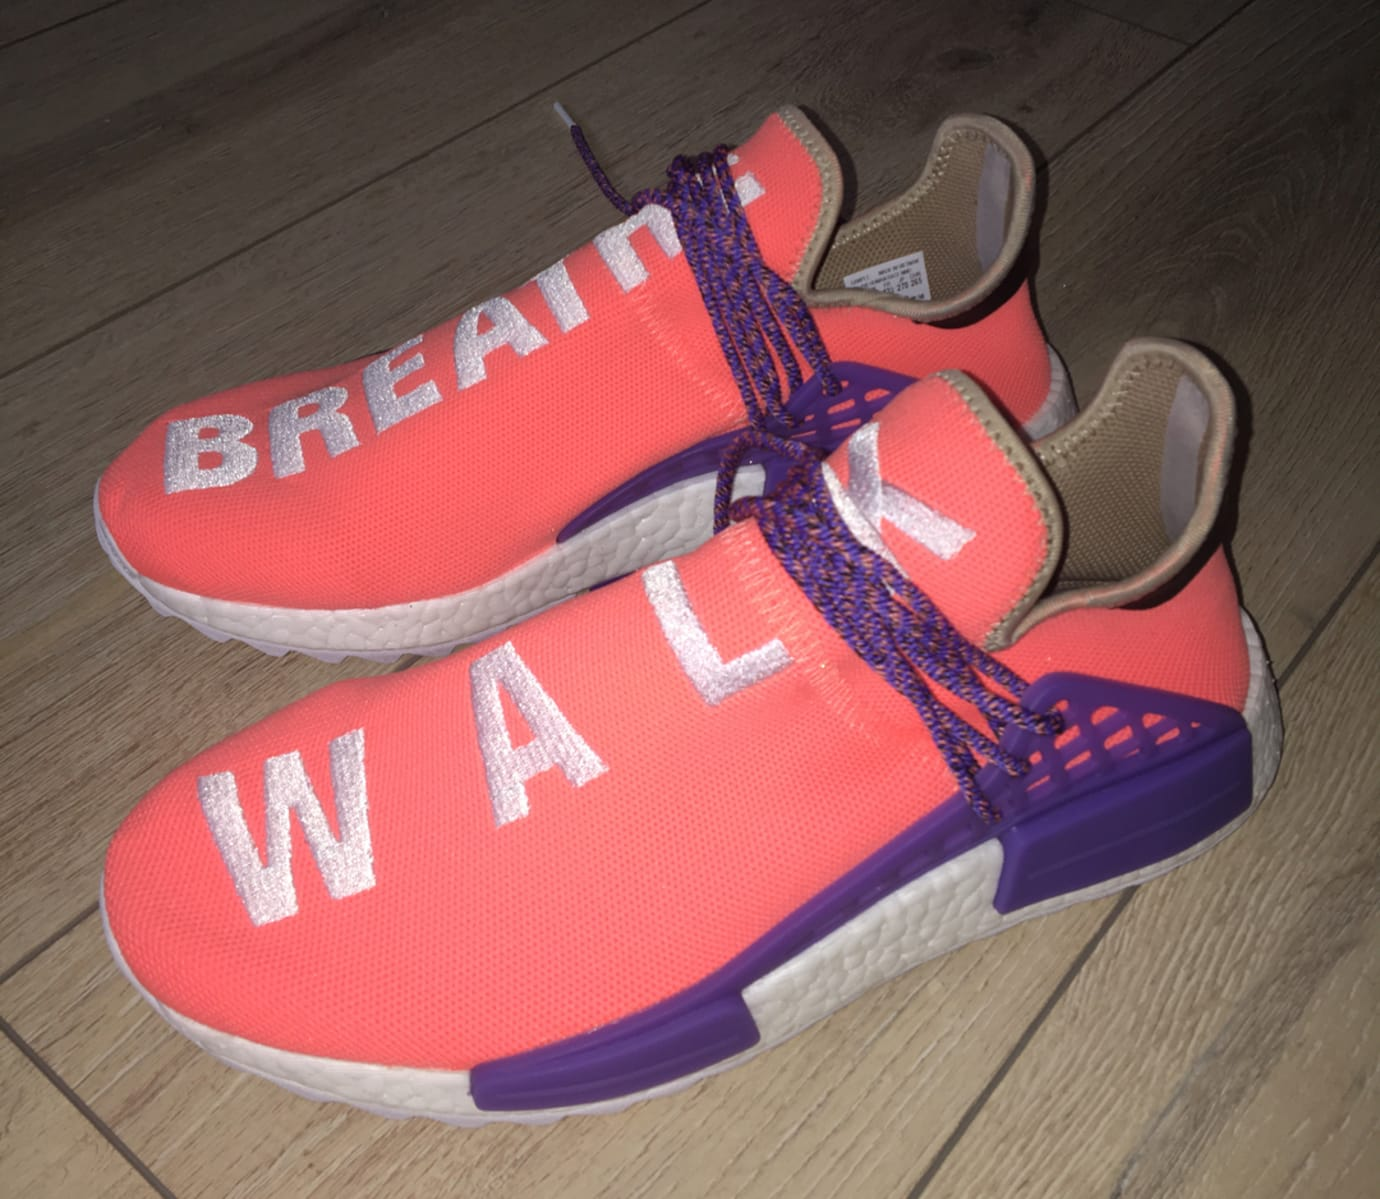 Pharrell x Adidas NMD Hu Breathe Walk Orange Purple Sample Dark